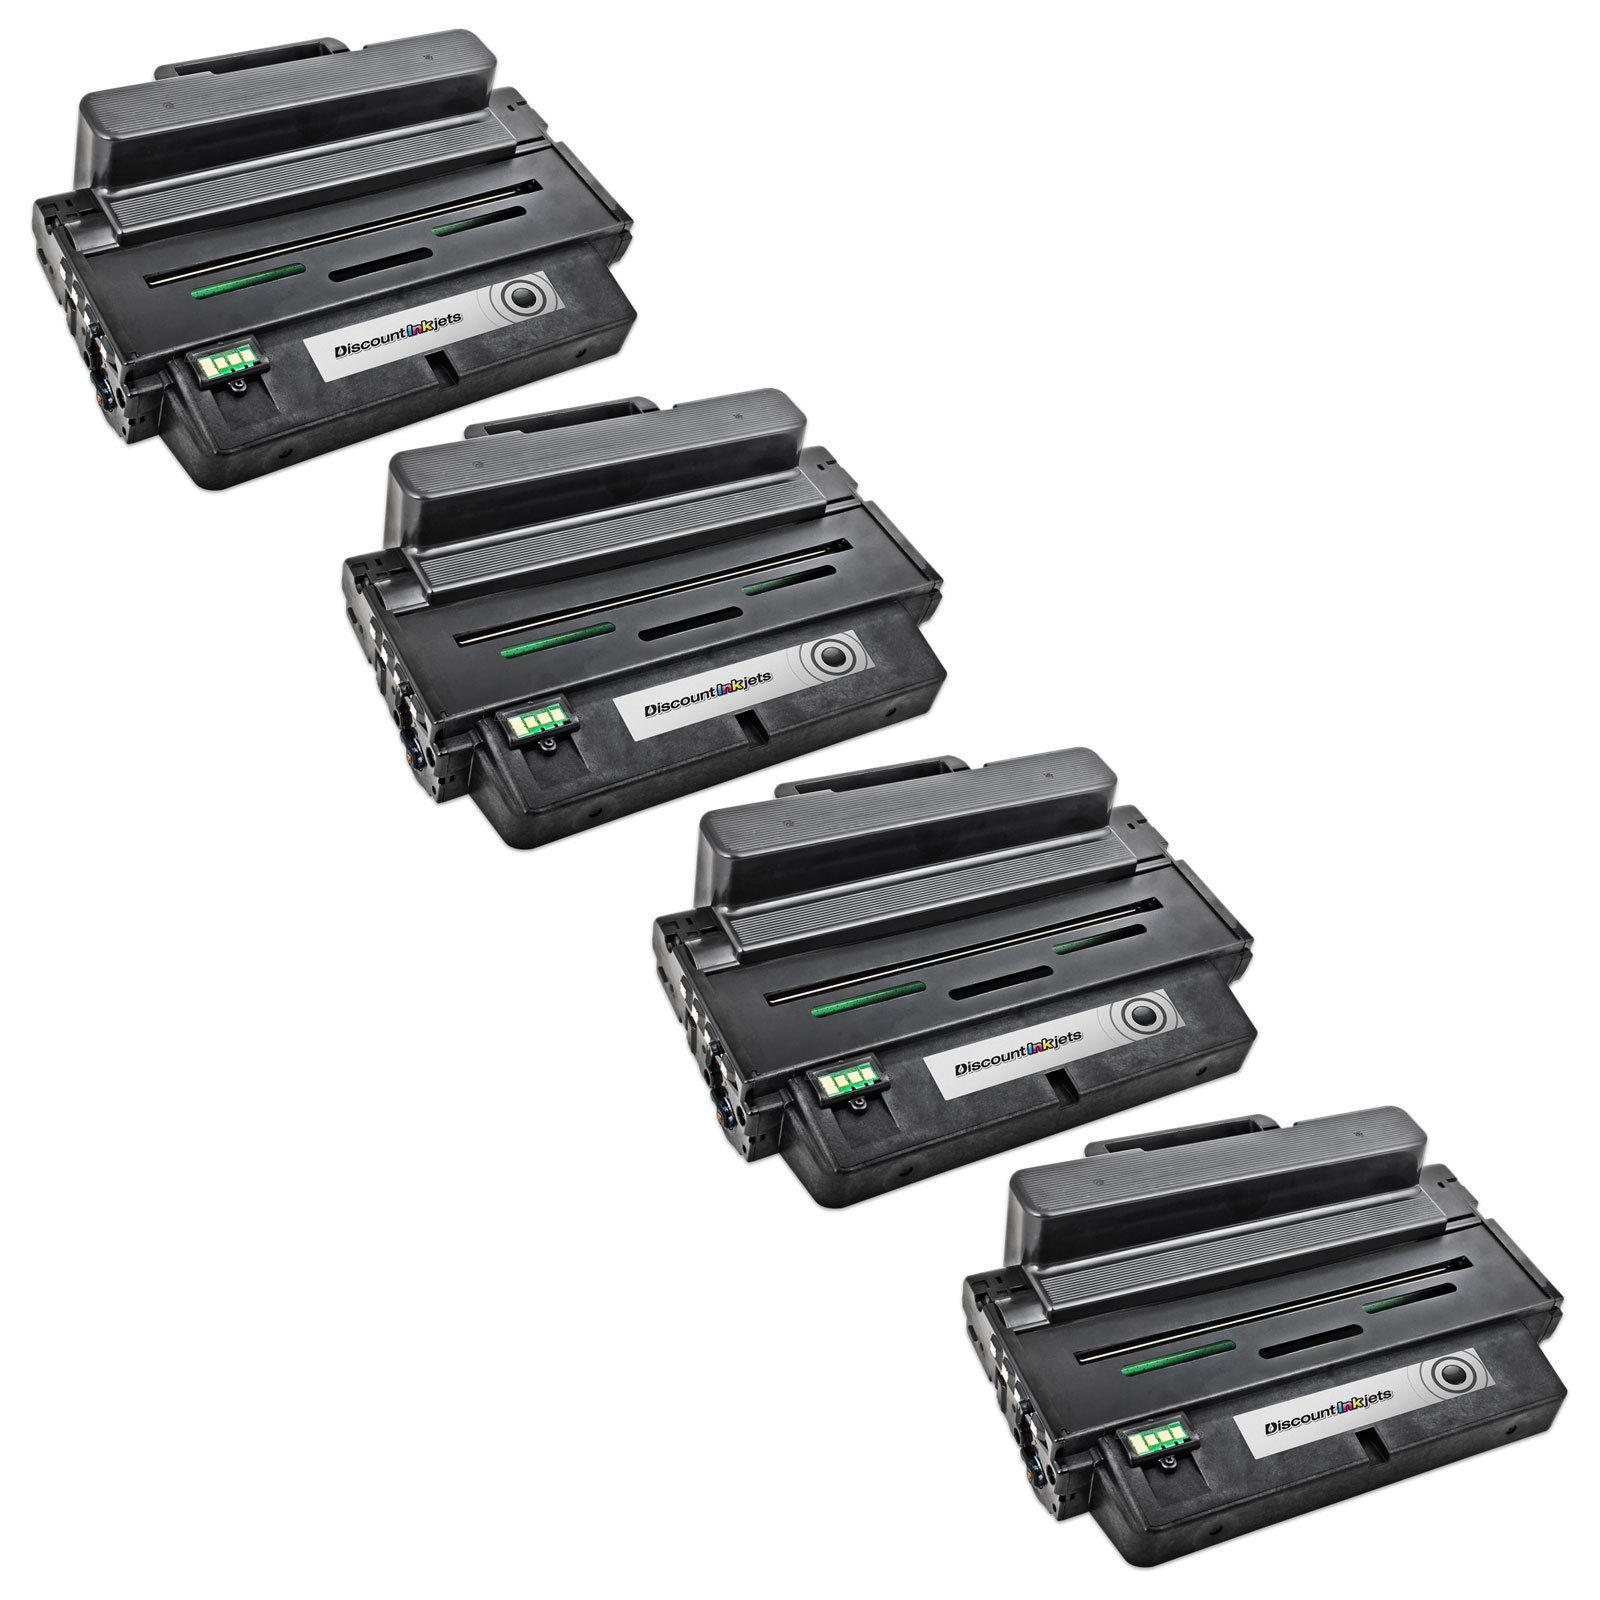 6 PK B2375 Black Toner Cartridge Compatible for Dell B2375dnf B2375dfw 593-BBBJ